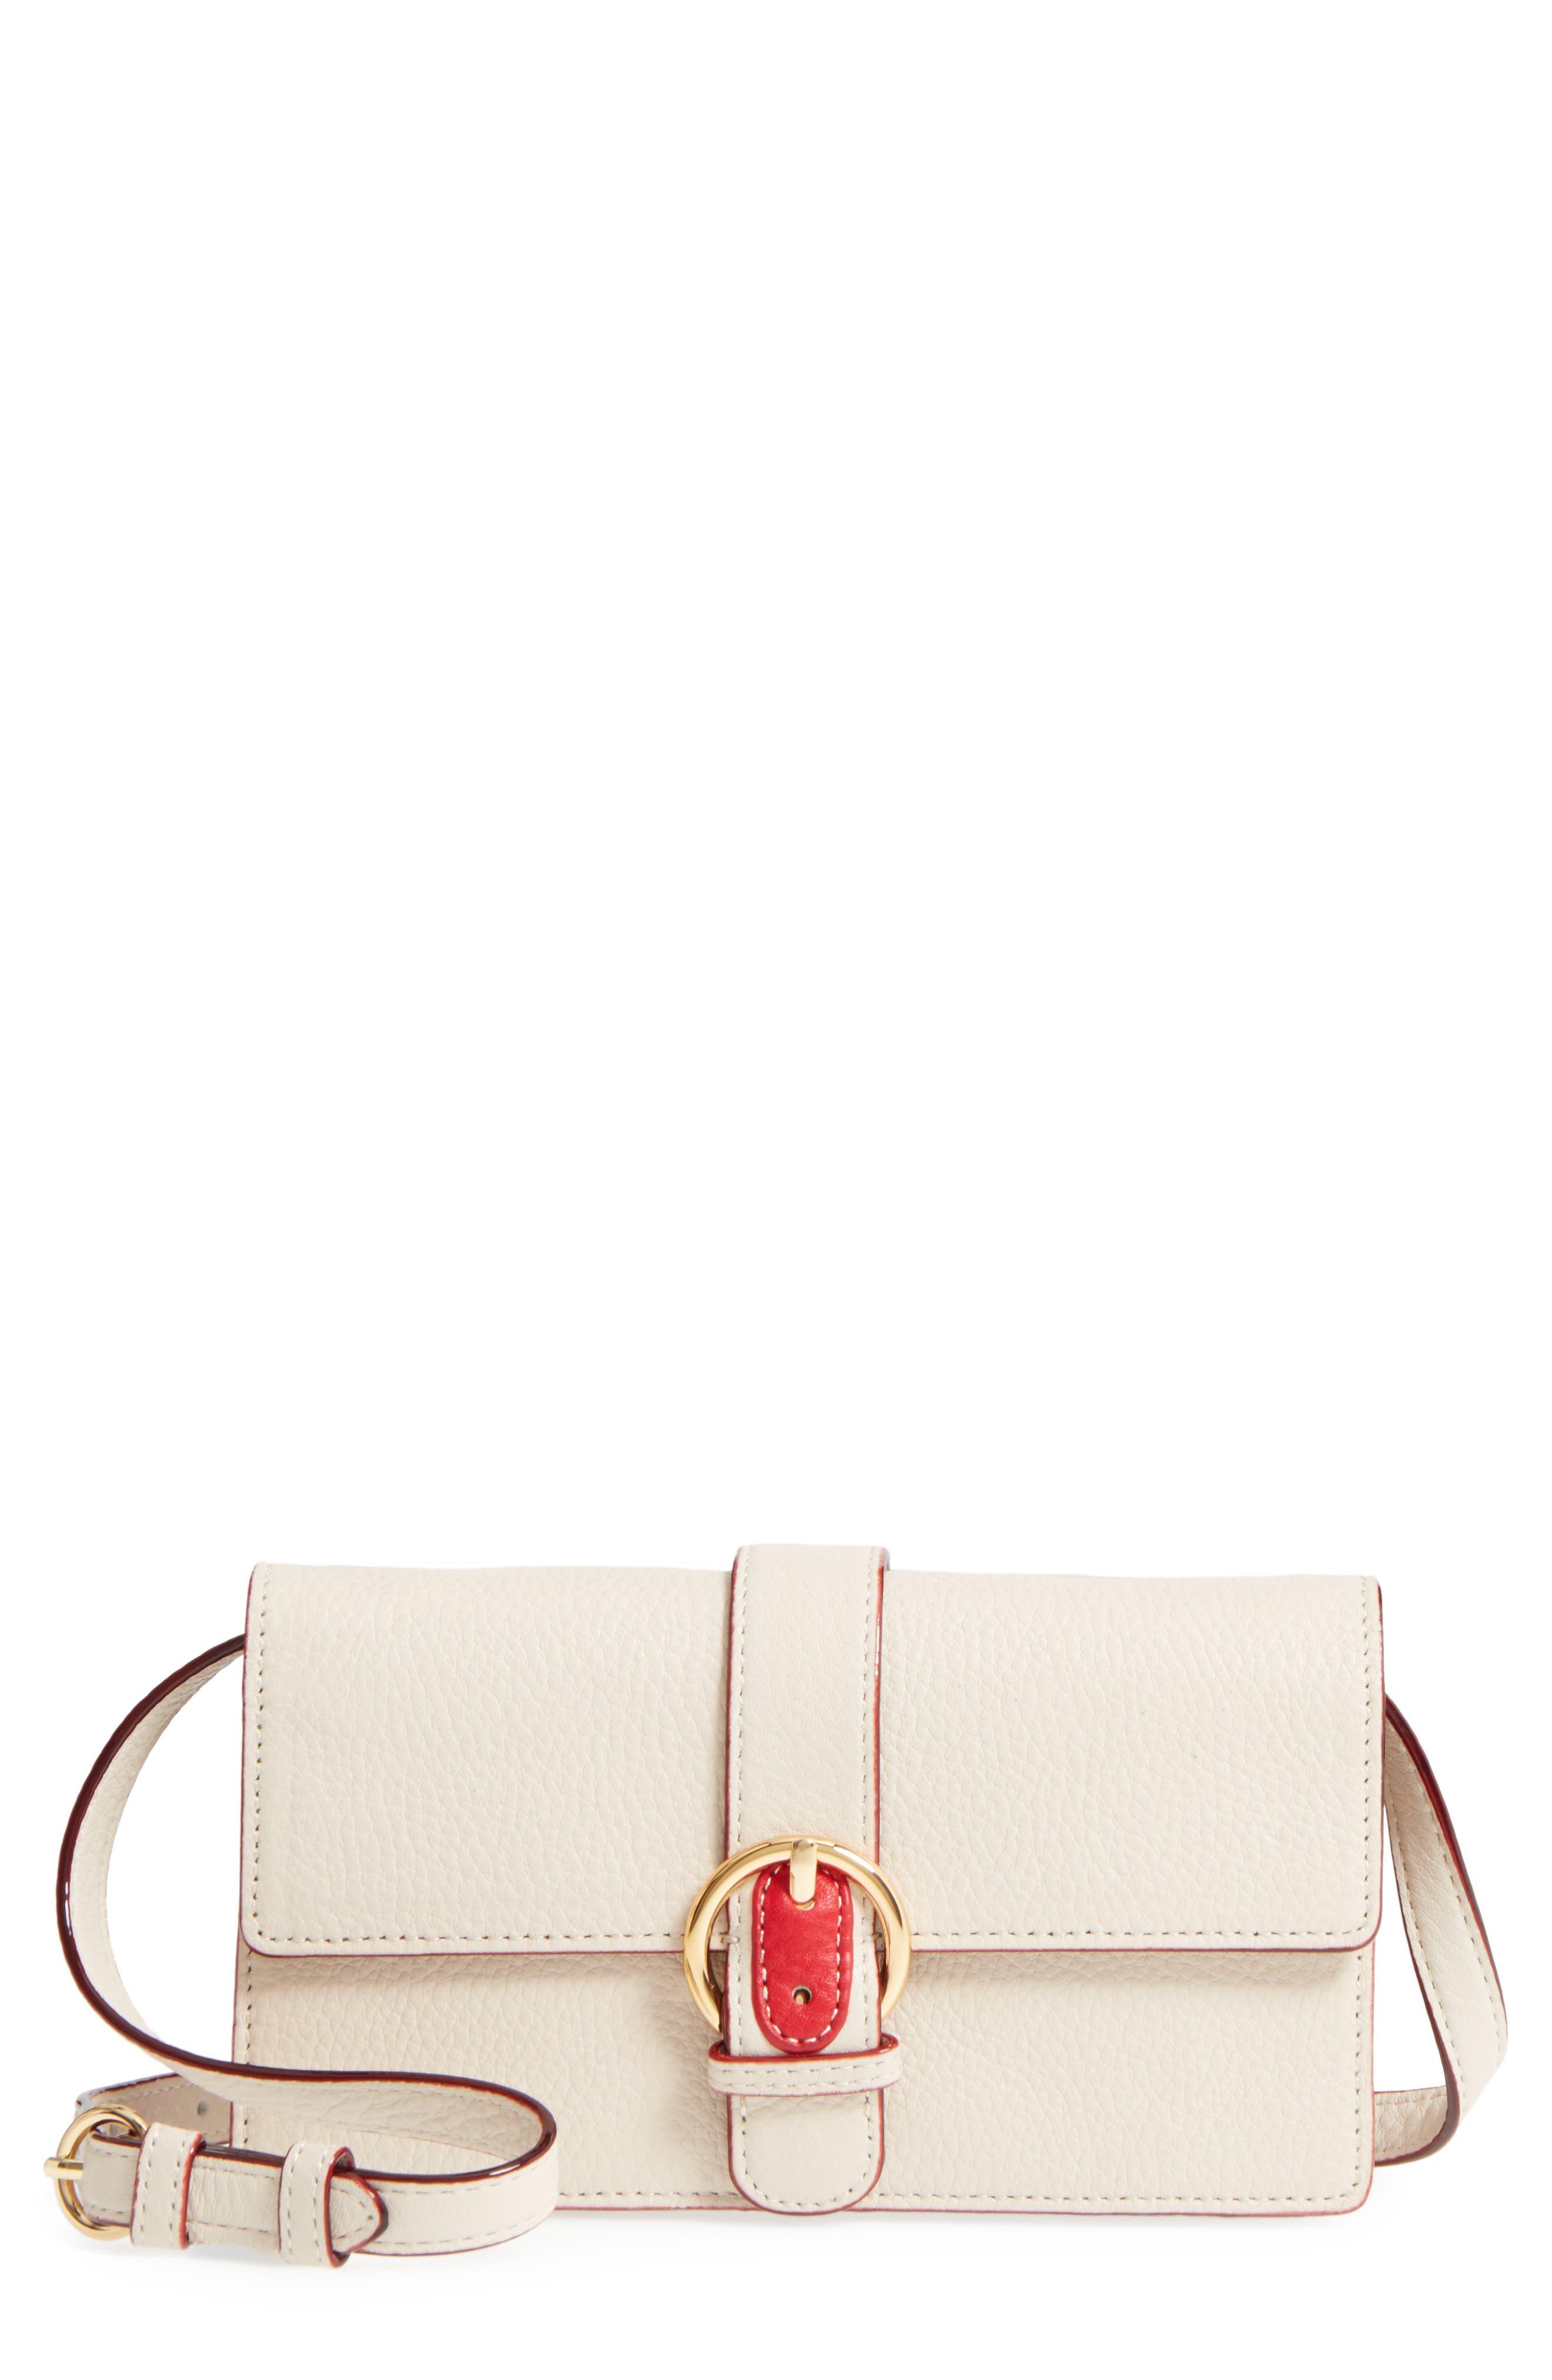 Frances Valentine Calfskin Leather Crossbody Wallet